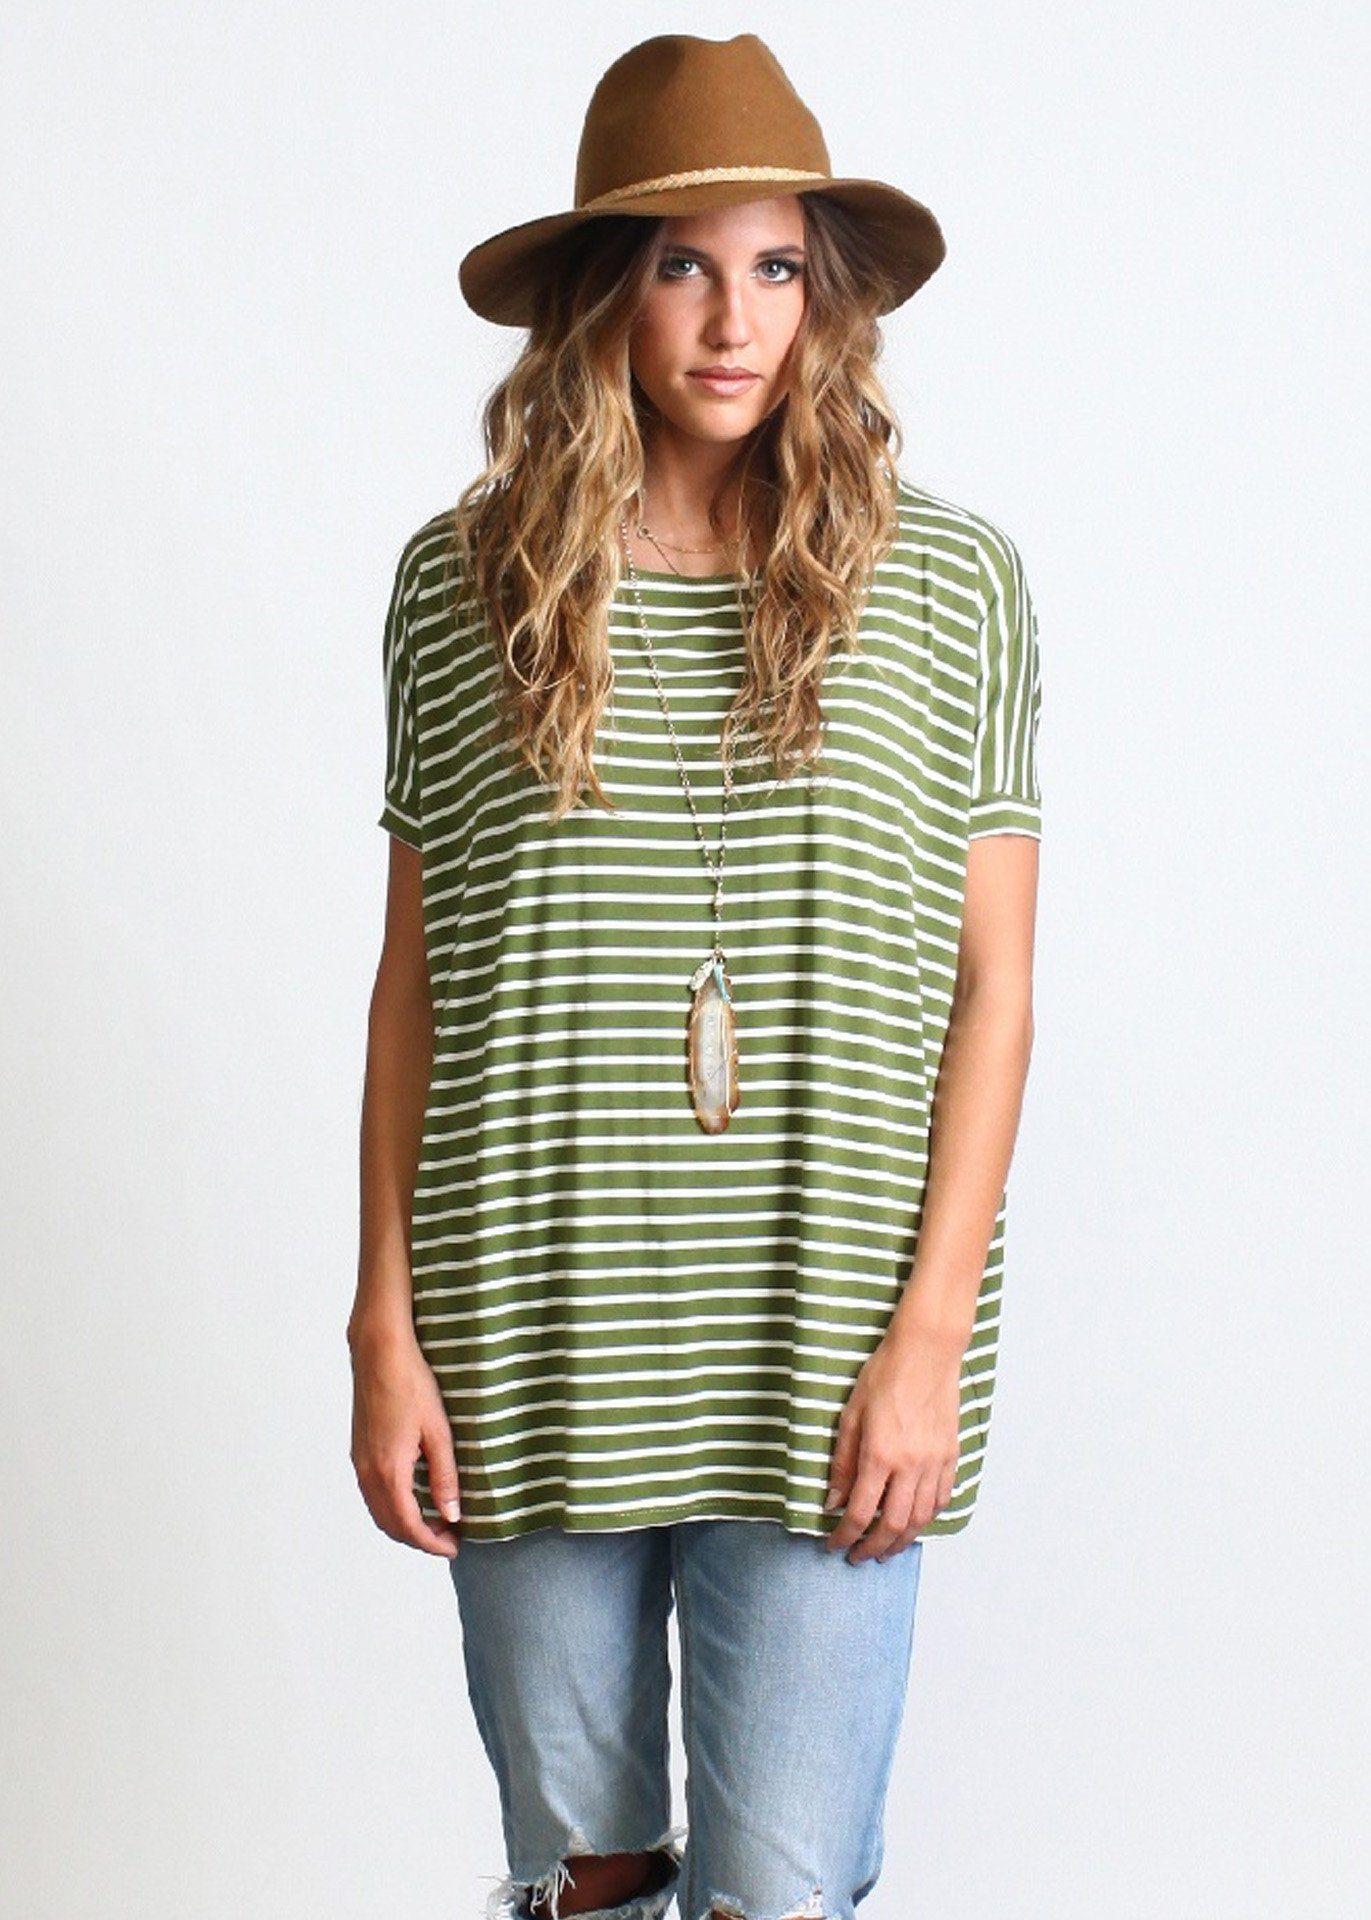 Original Short Sleeve Top - Bamboo & Organic Clothing - PIKO - 1